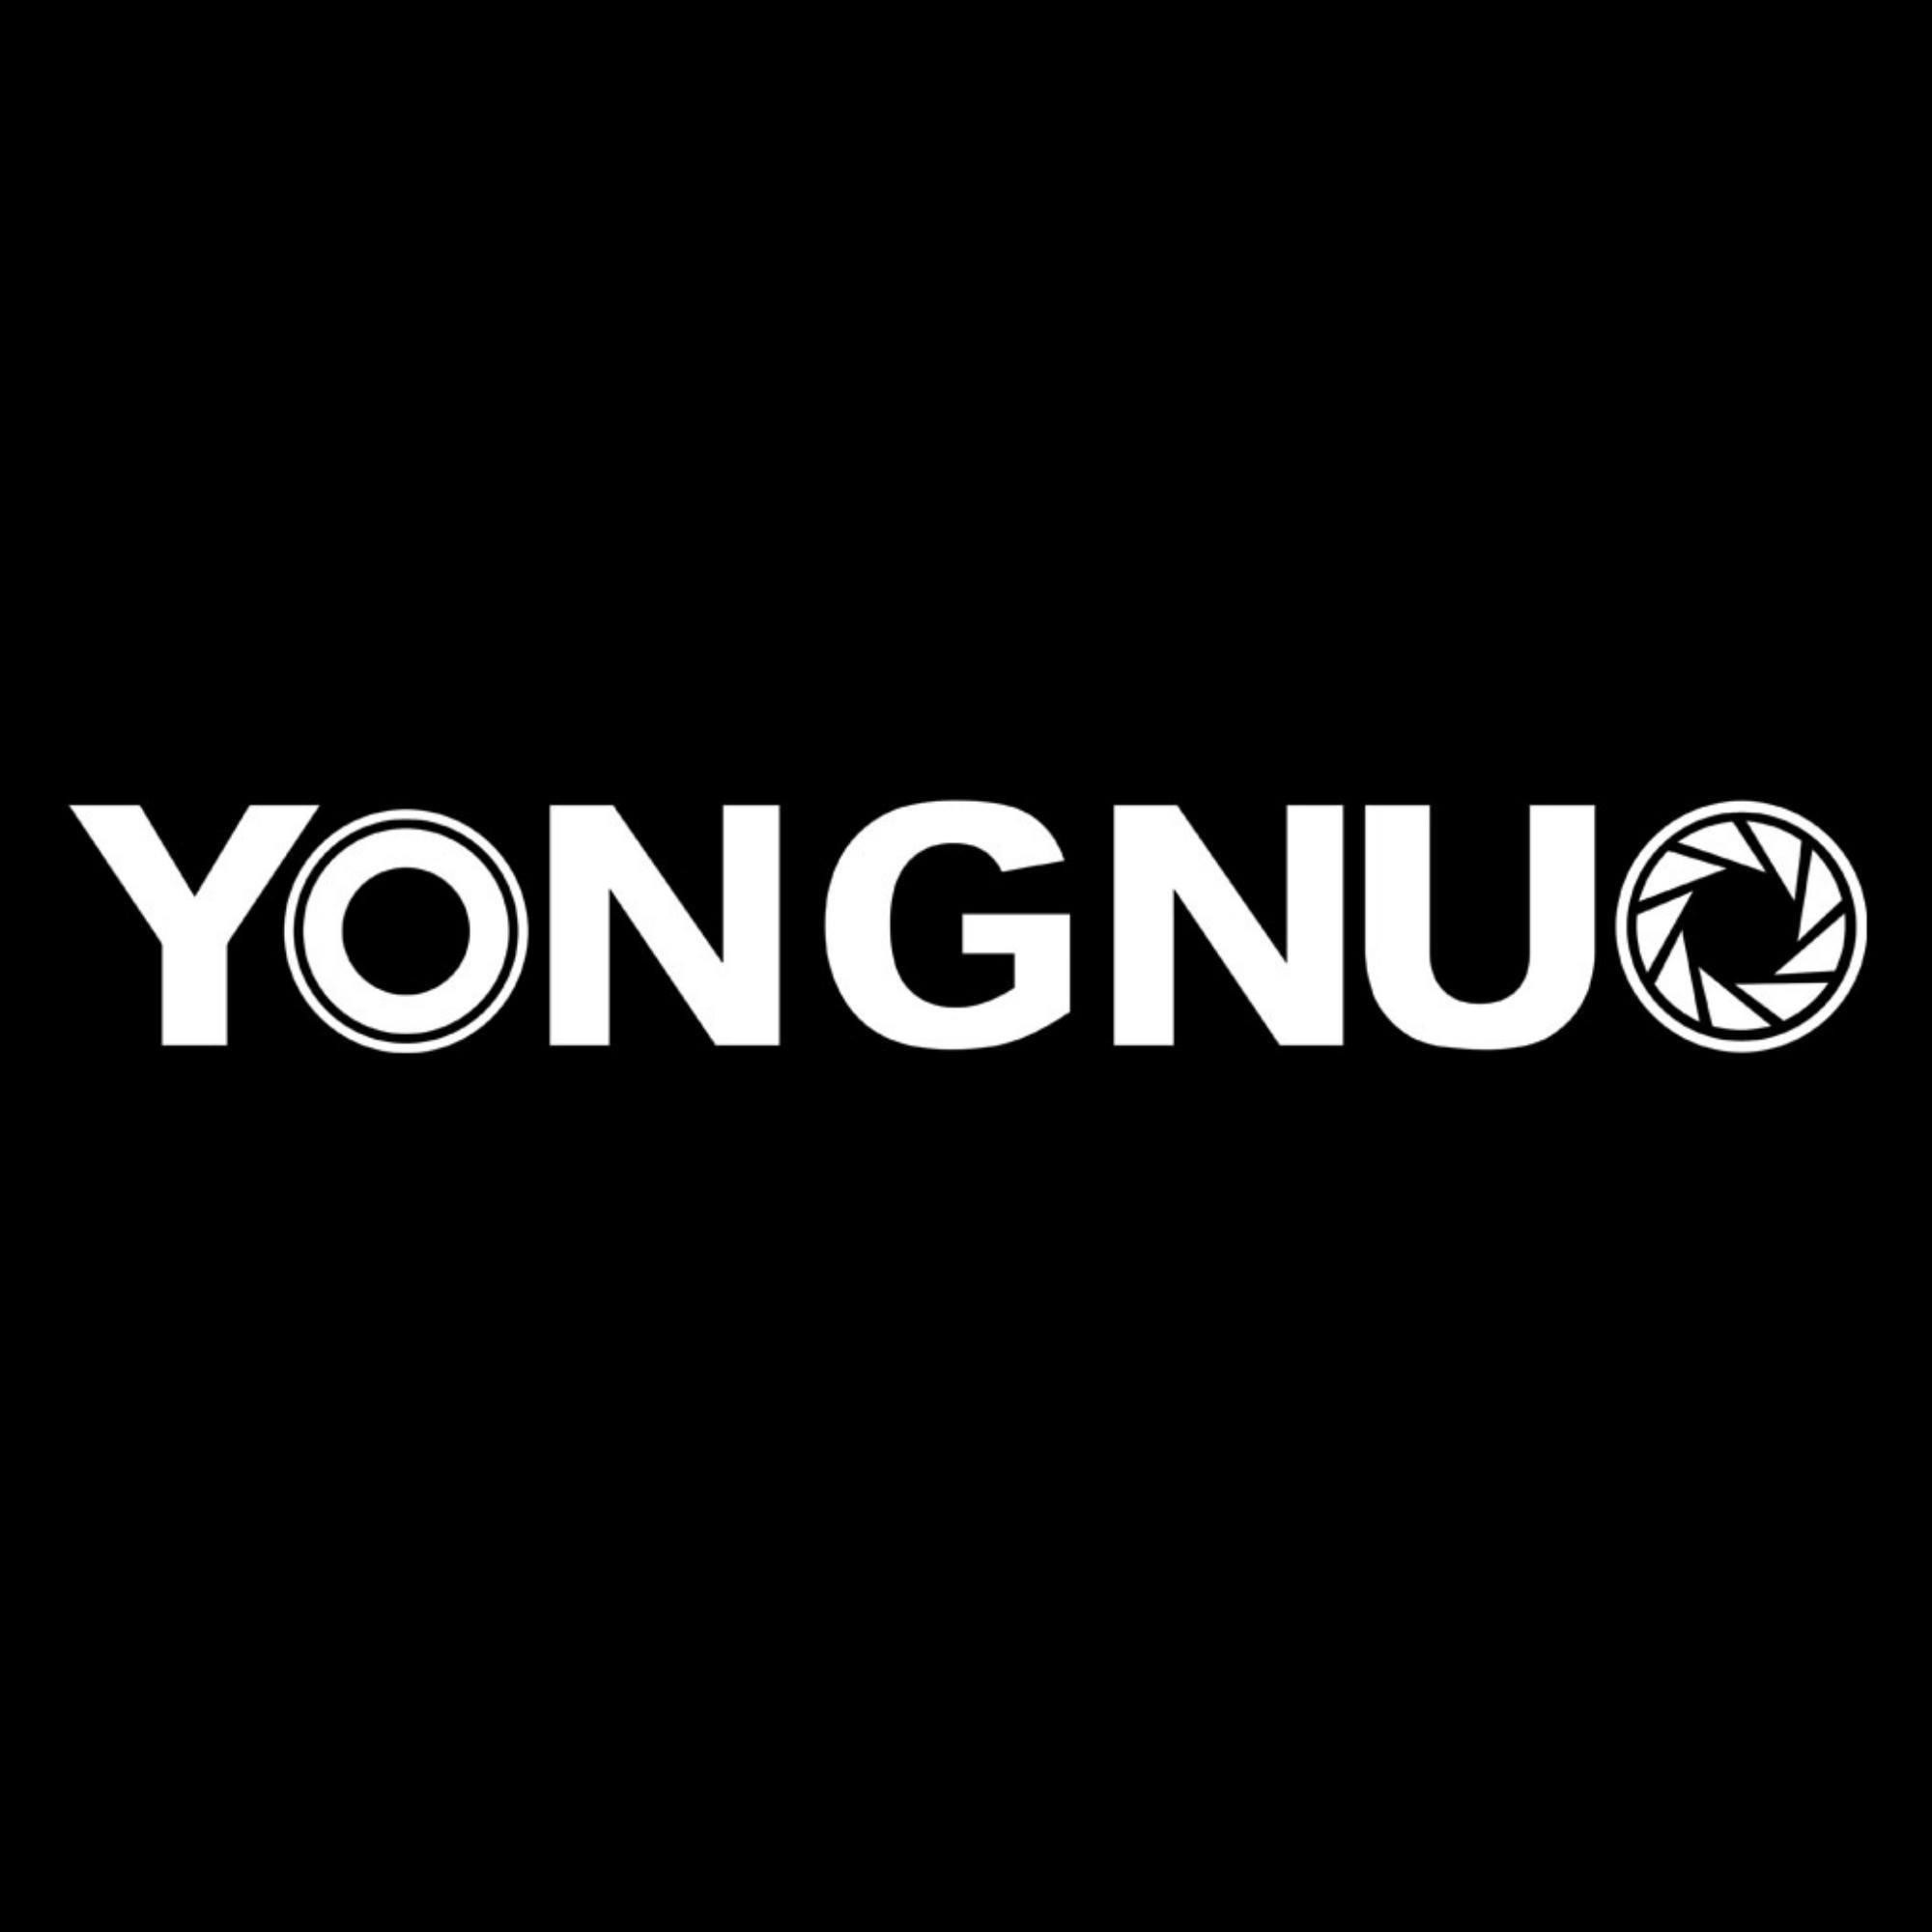 Yongnuo-logo